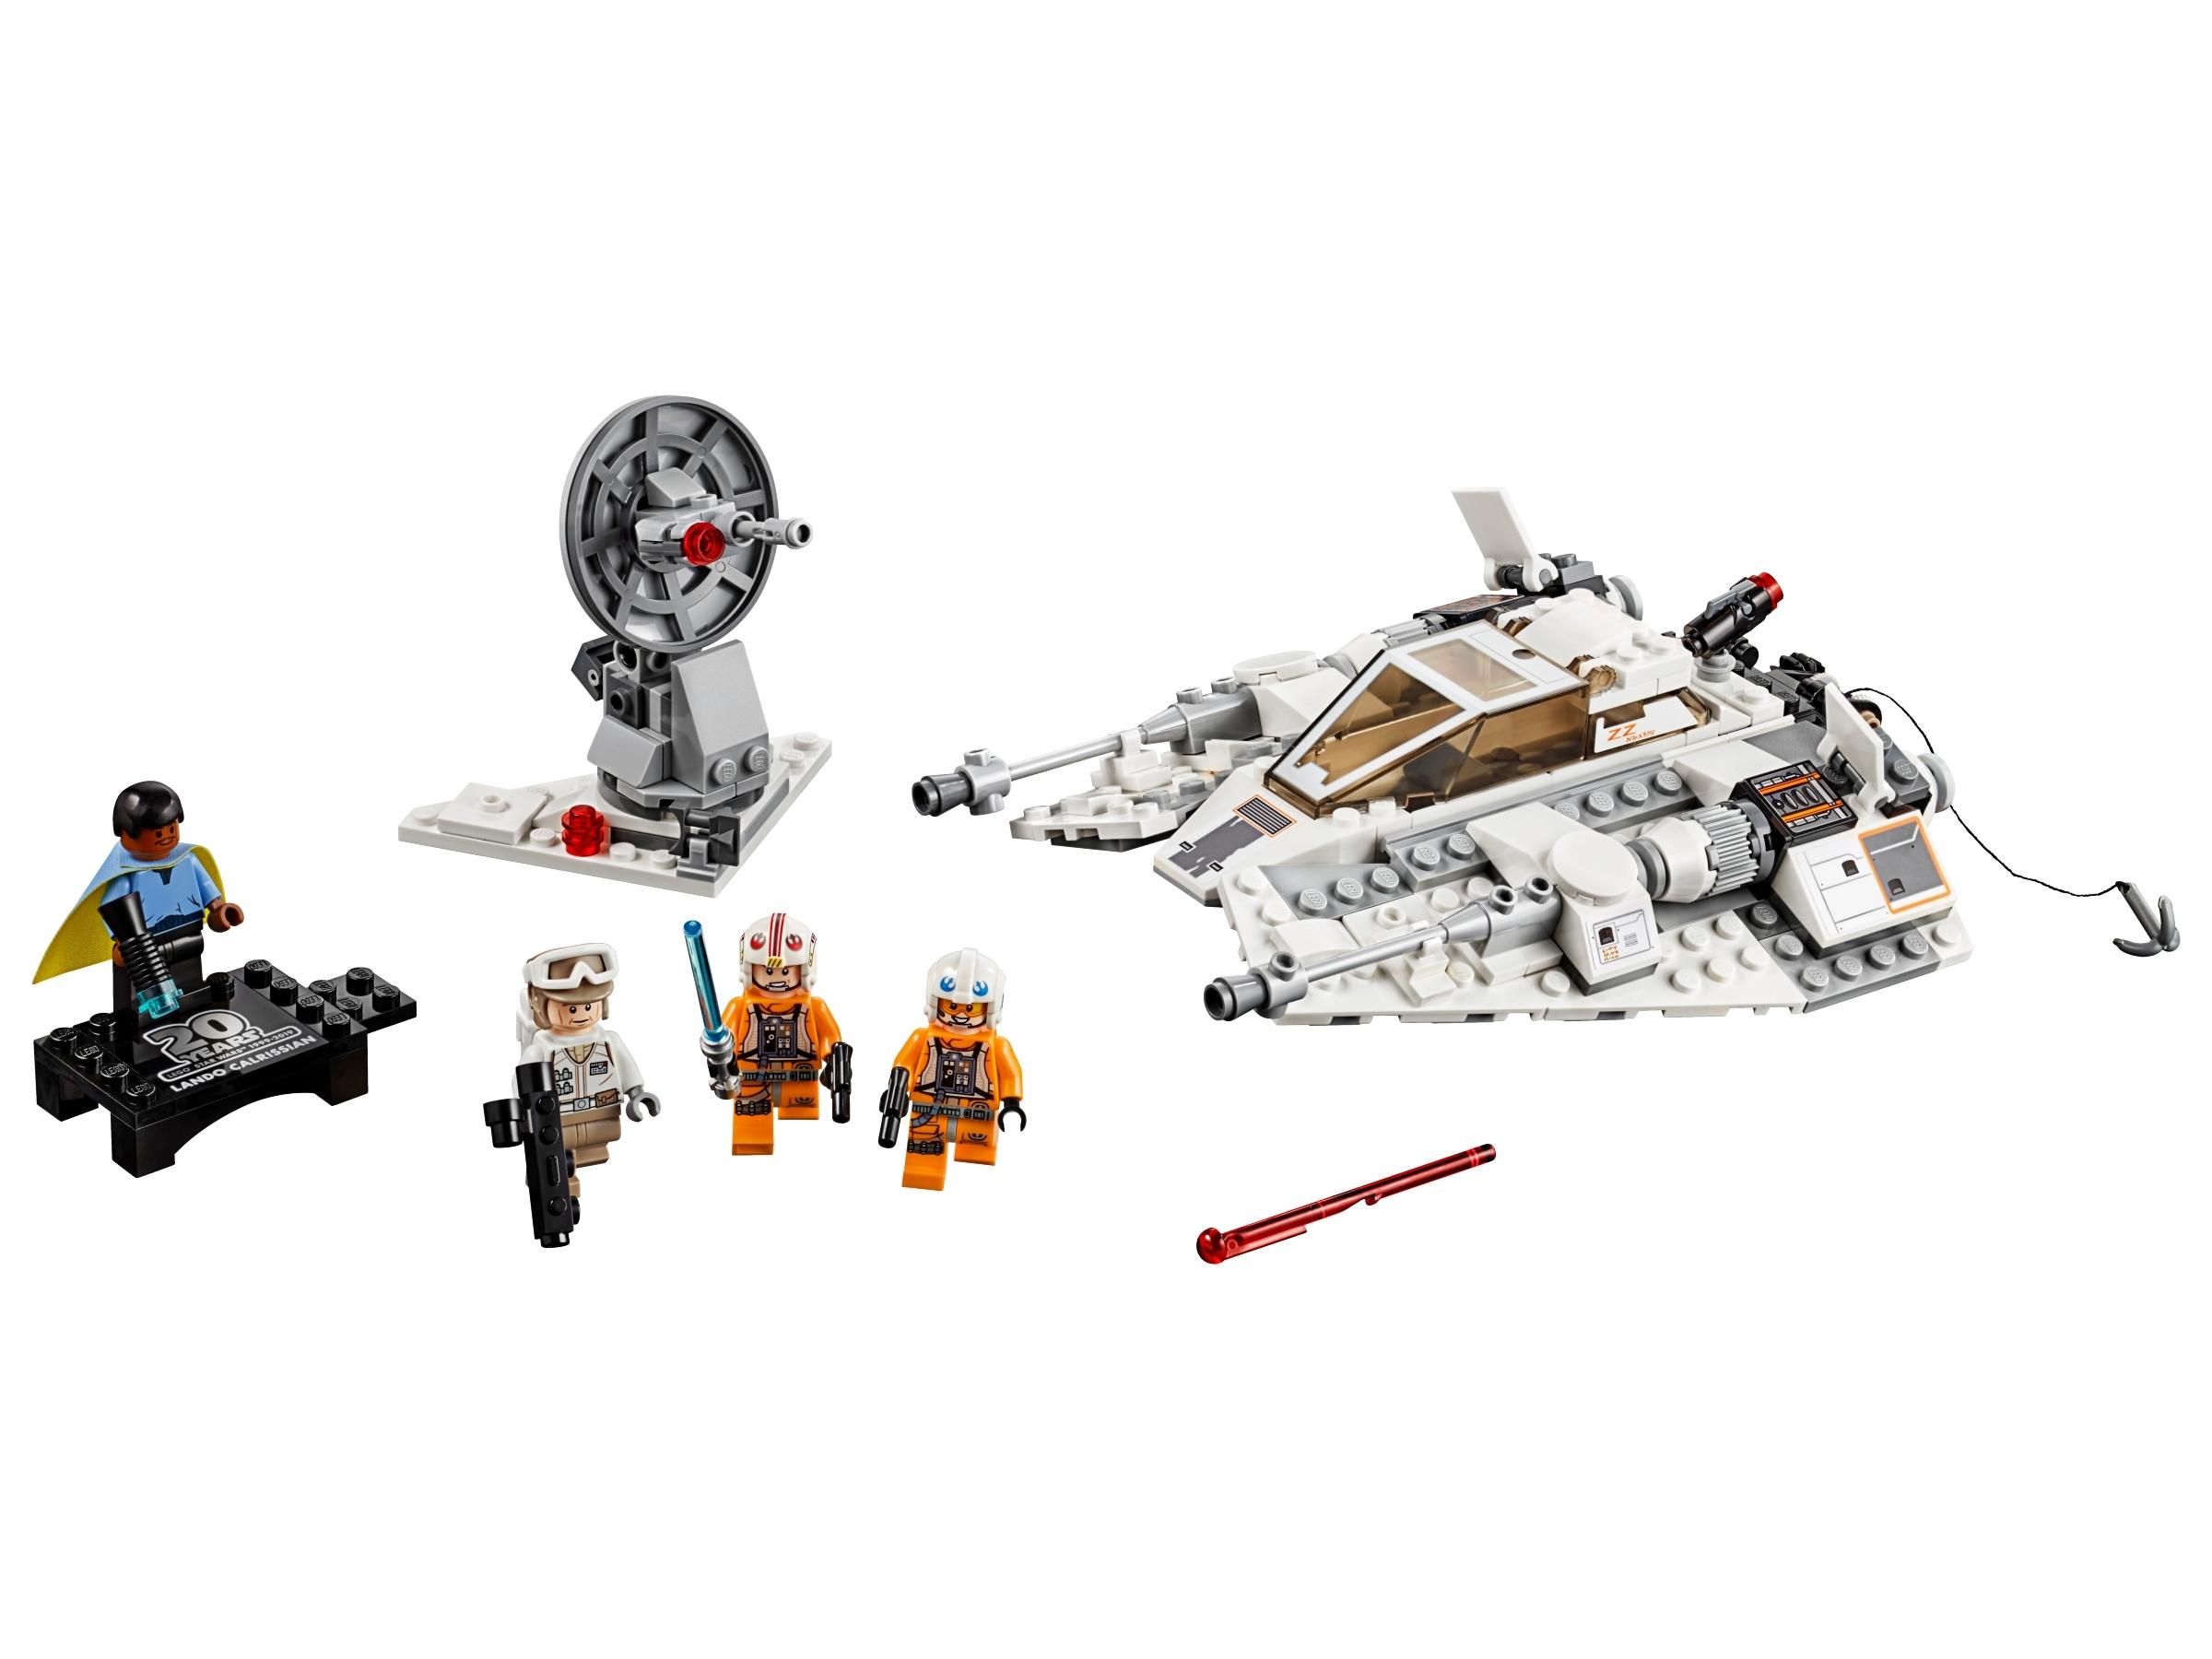 75258-2019 LEGO STAR WARS LUKE SKYWALKER 20TH ANNIVERSARY